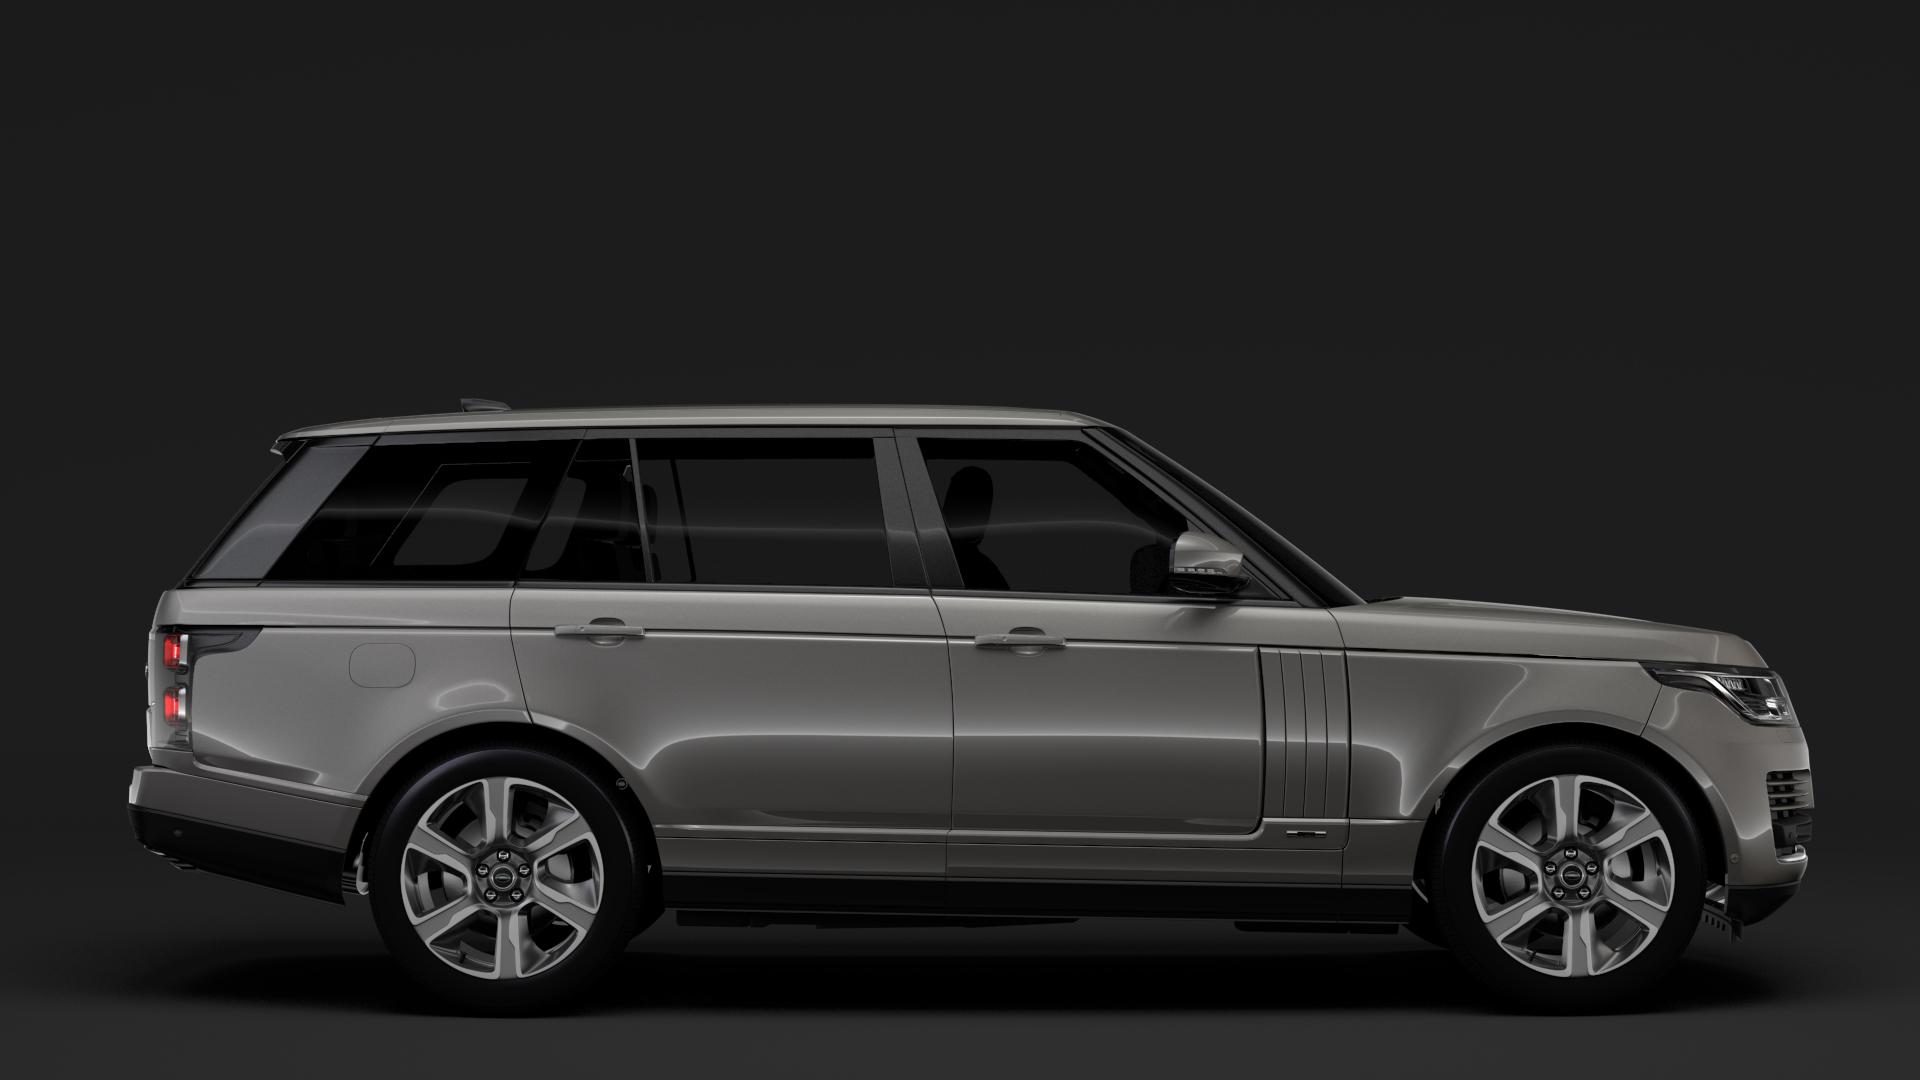 range rover hybrid lwb l405 2018 3d model max fbx c4d lwo ma mb hrc xsi obj 277423